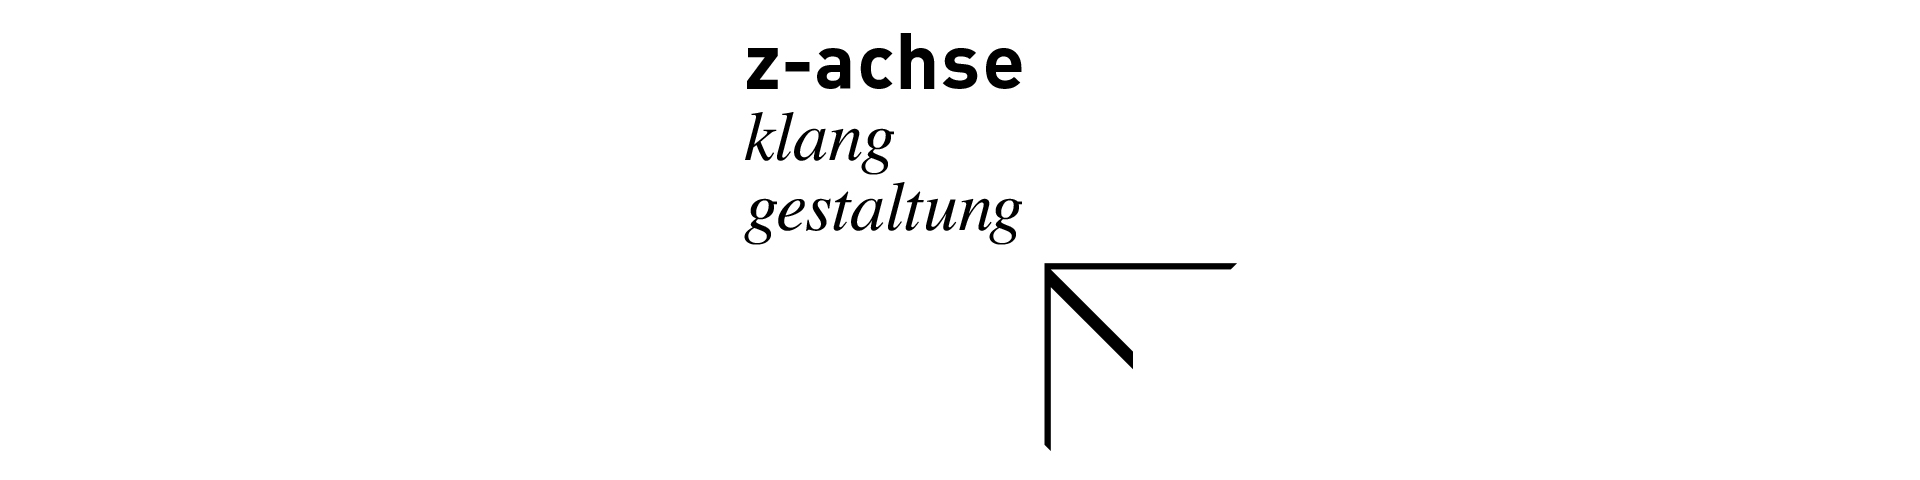 z-achse